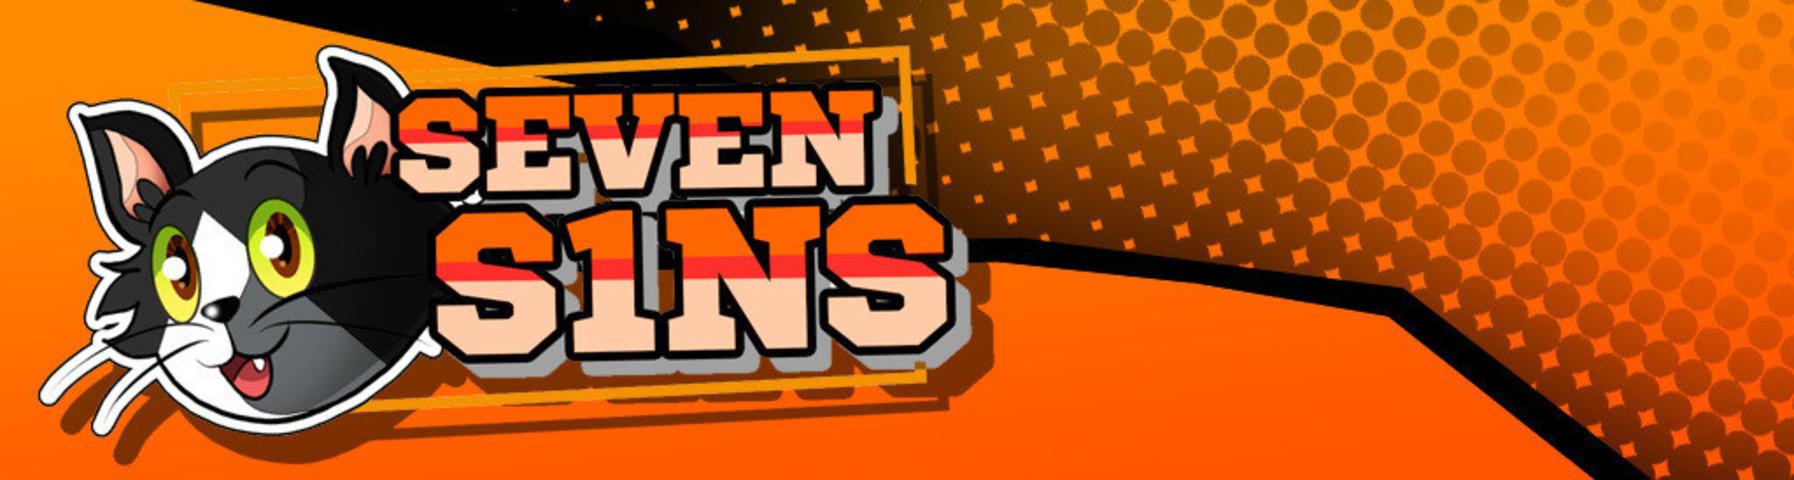 SevenS1ns